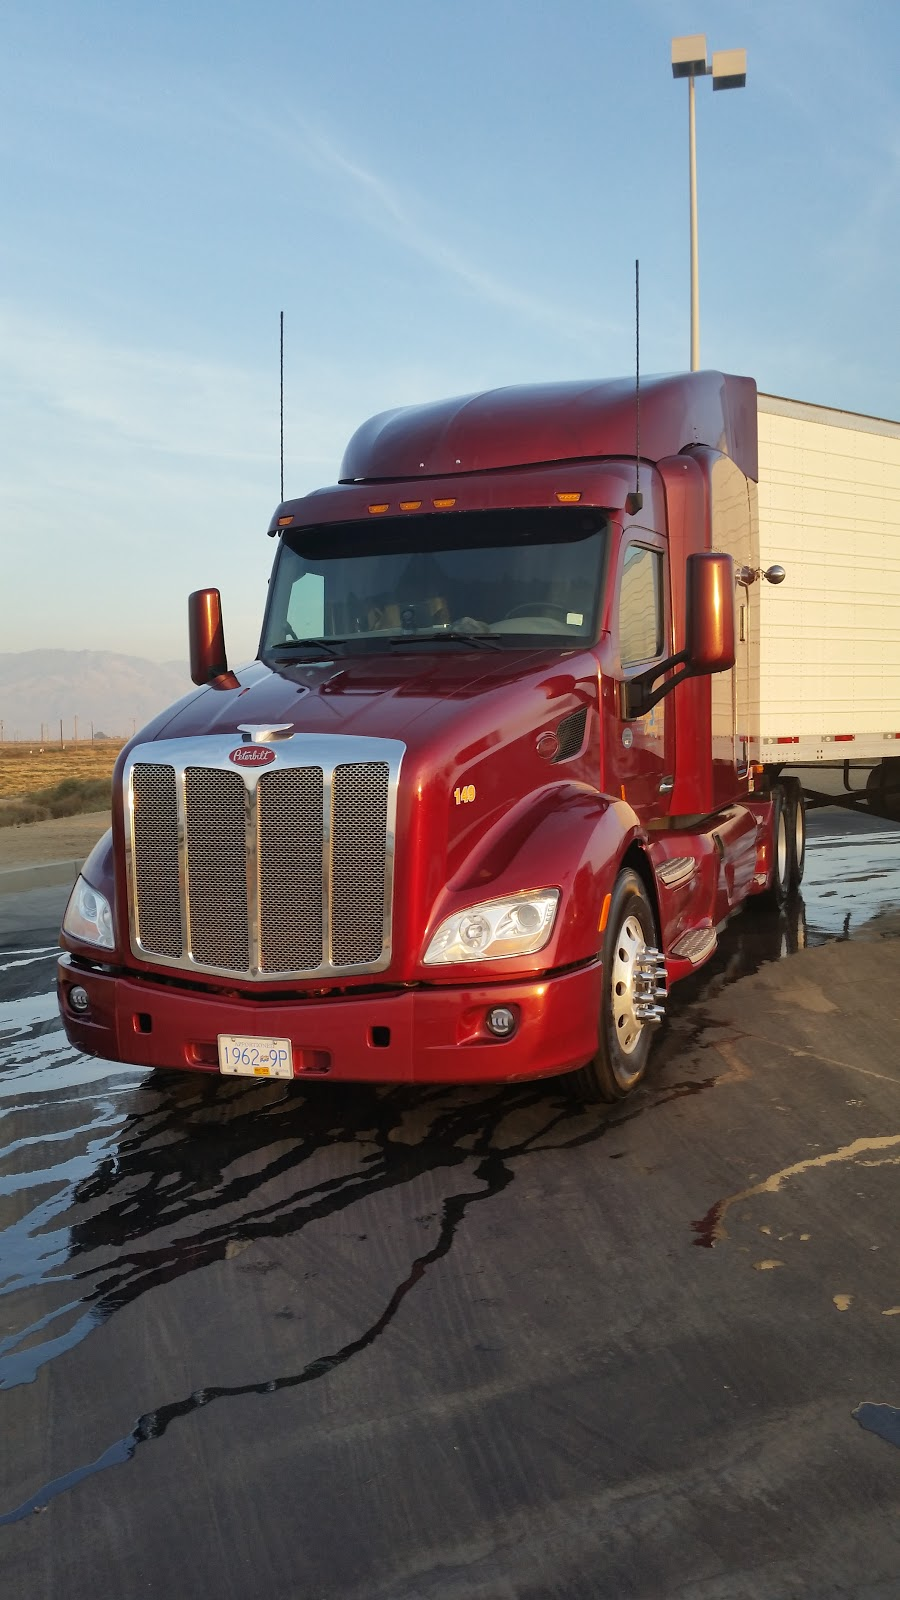 Blue Beacon Truck Wash of Wheeler Ridge, CA - car wash    Photo 4 of 10   Address: 5831 Santa Elena Dr I-5 Exit, 219A, Arvin, CA 93203, USA   Phone: (661) 858-2090